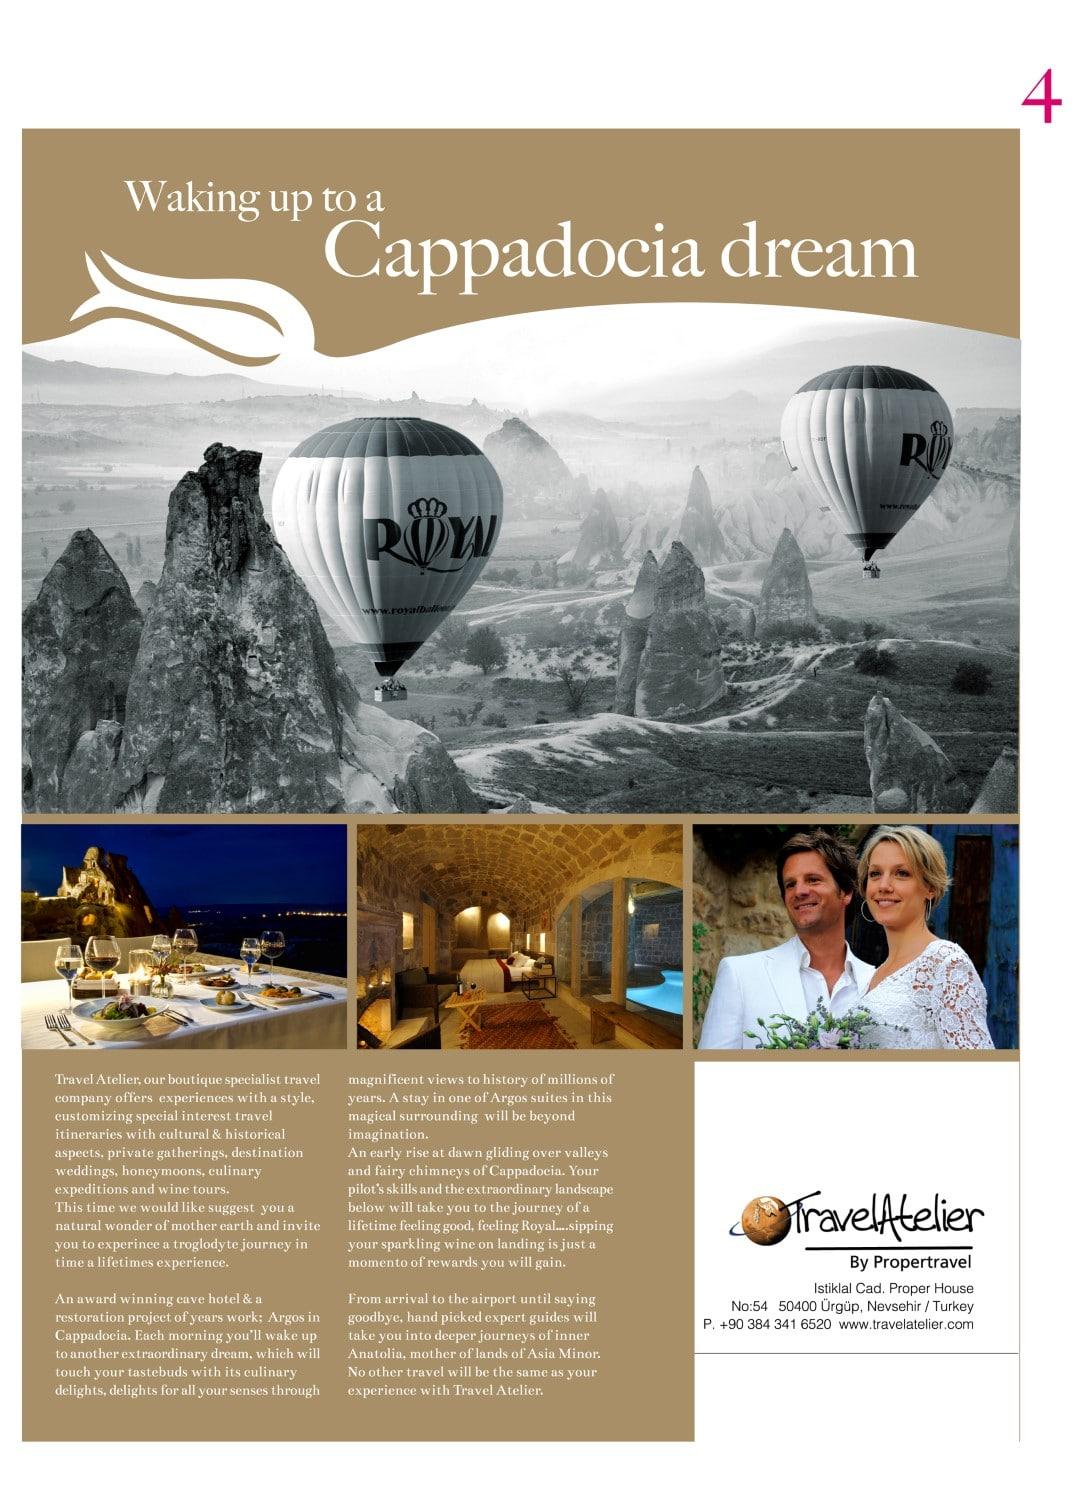 waking-up-cappadocia-dream-magazine